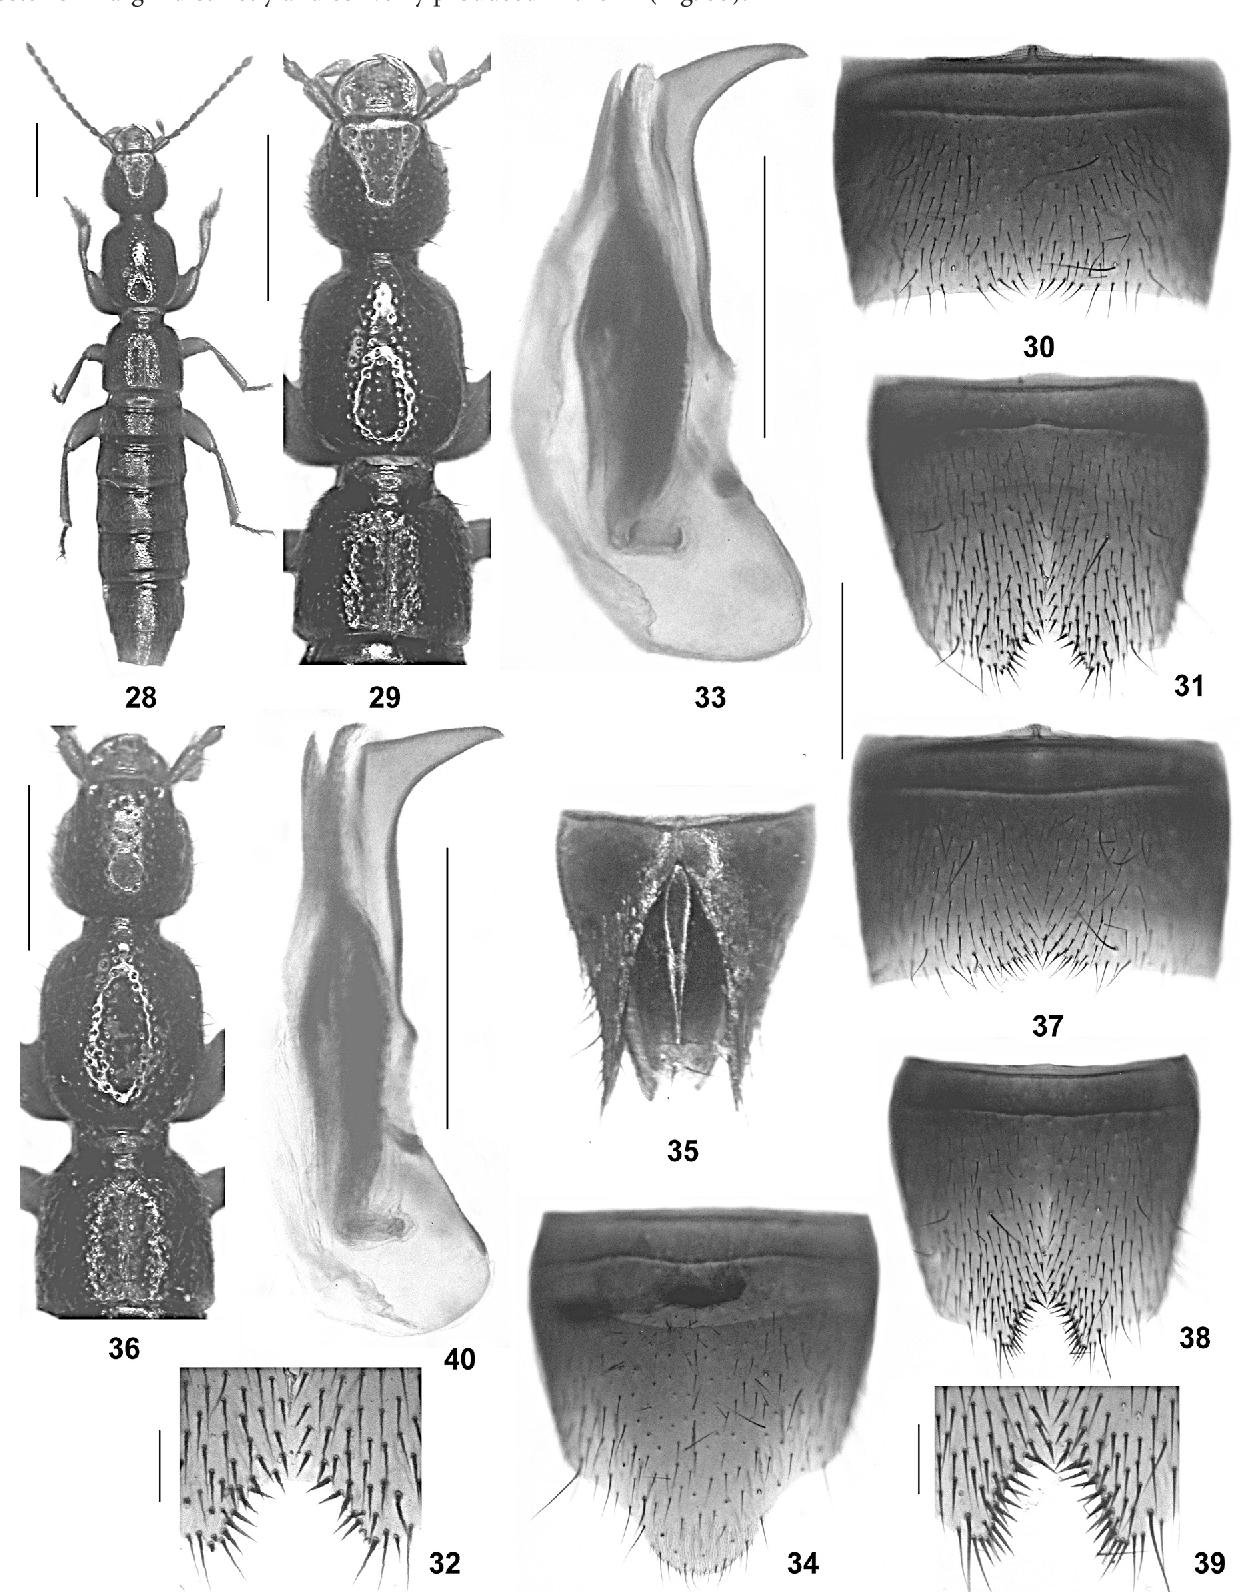 figure 28-40